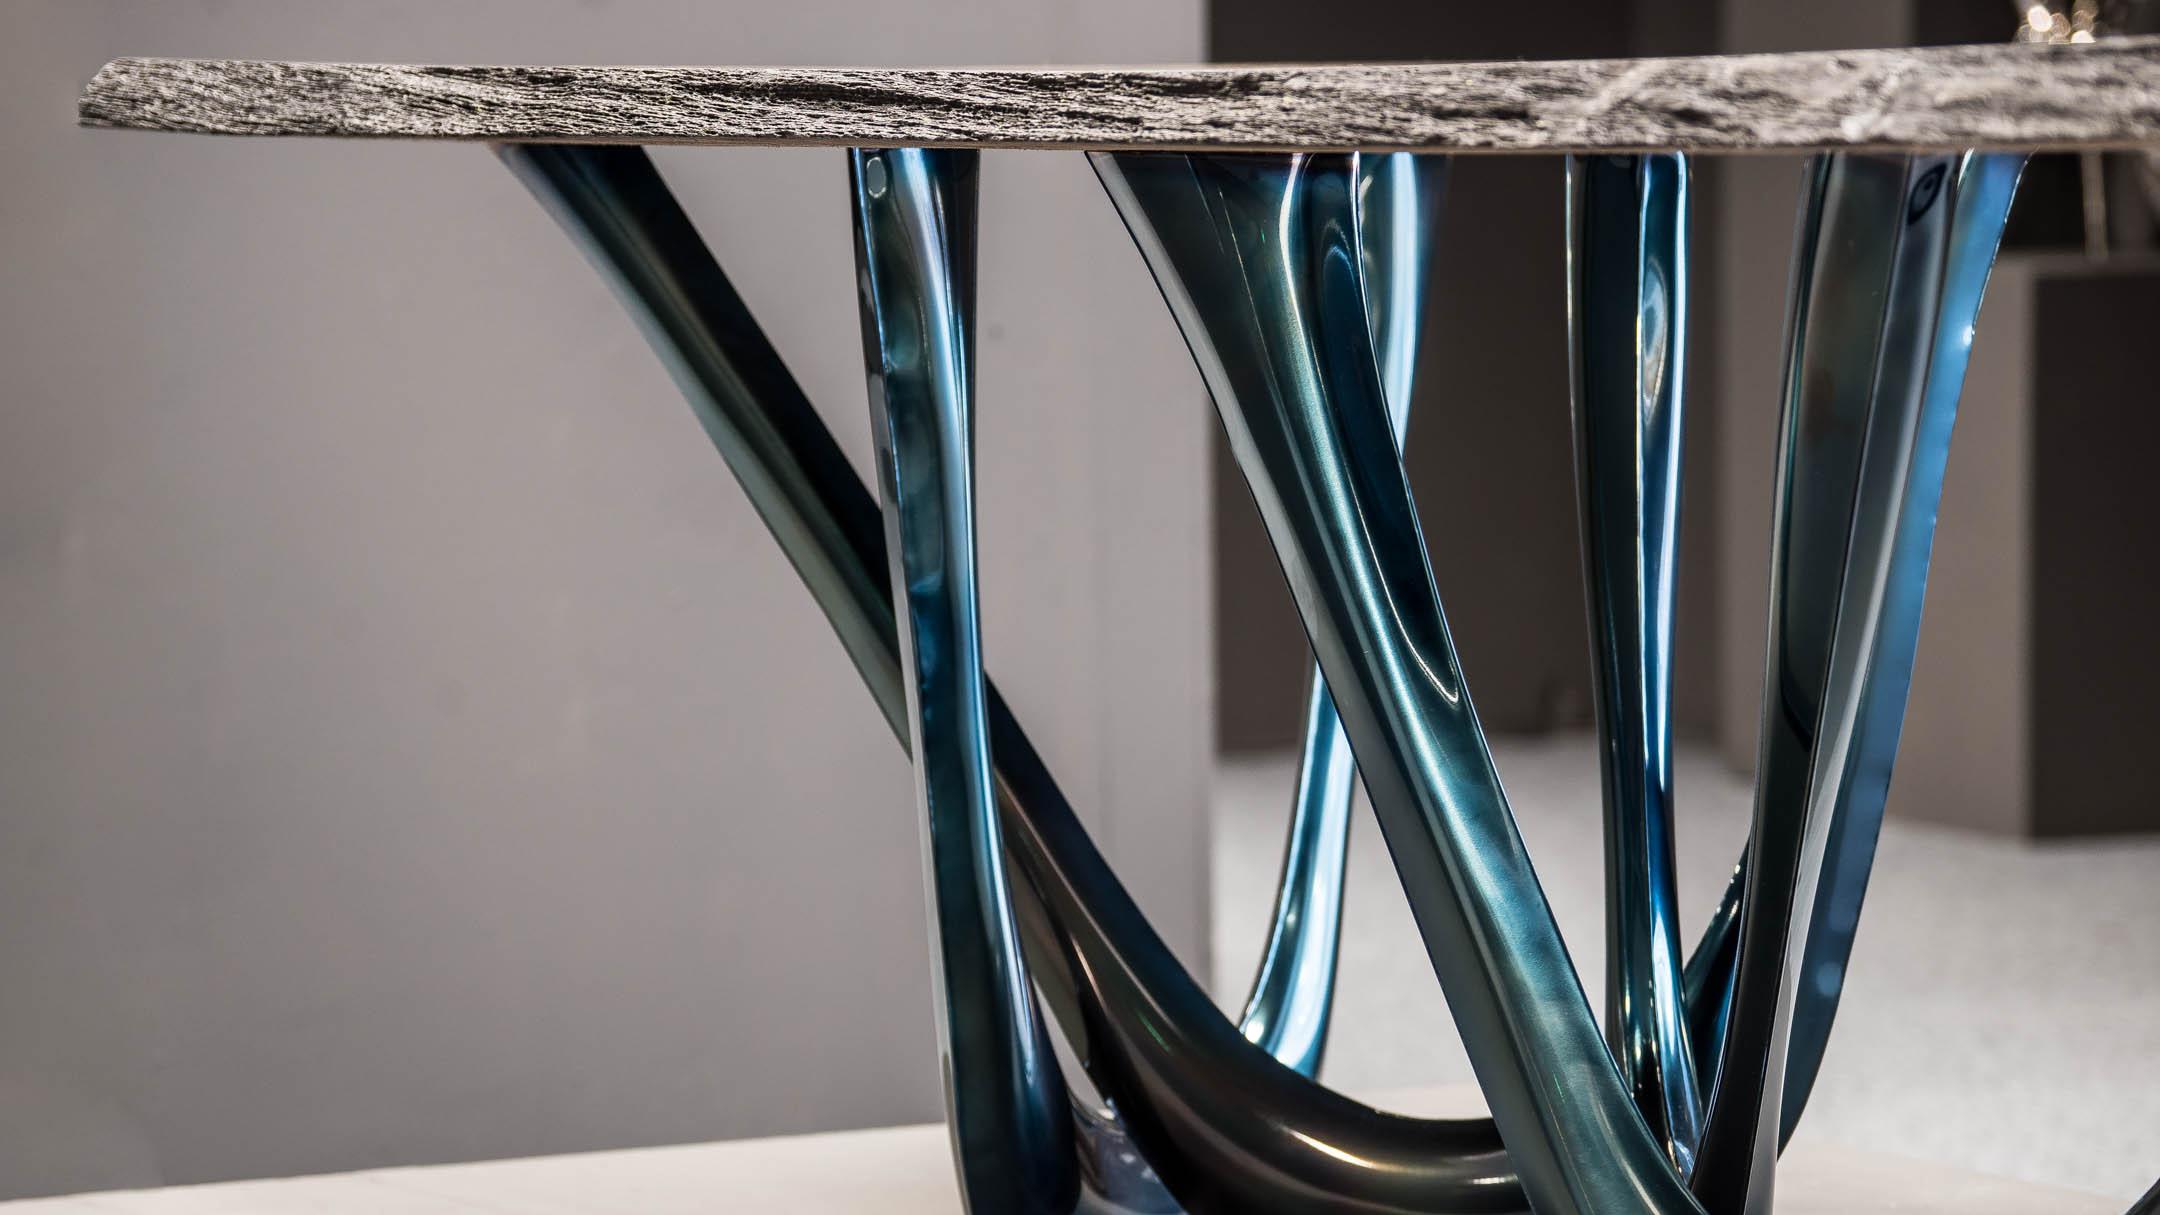 Zieta-Prozessdesign_G-Table-Ancient_Cosmic-Blue_6